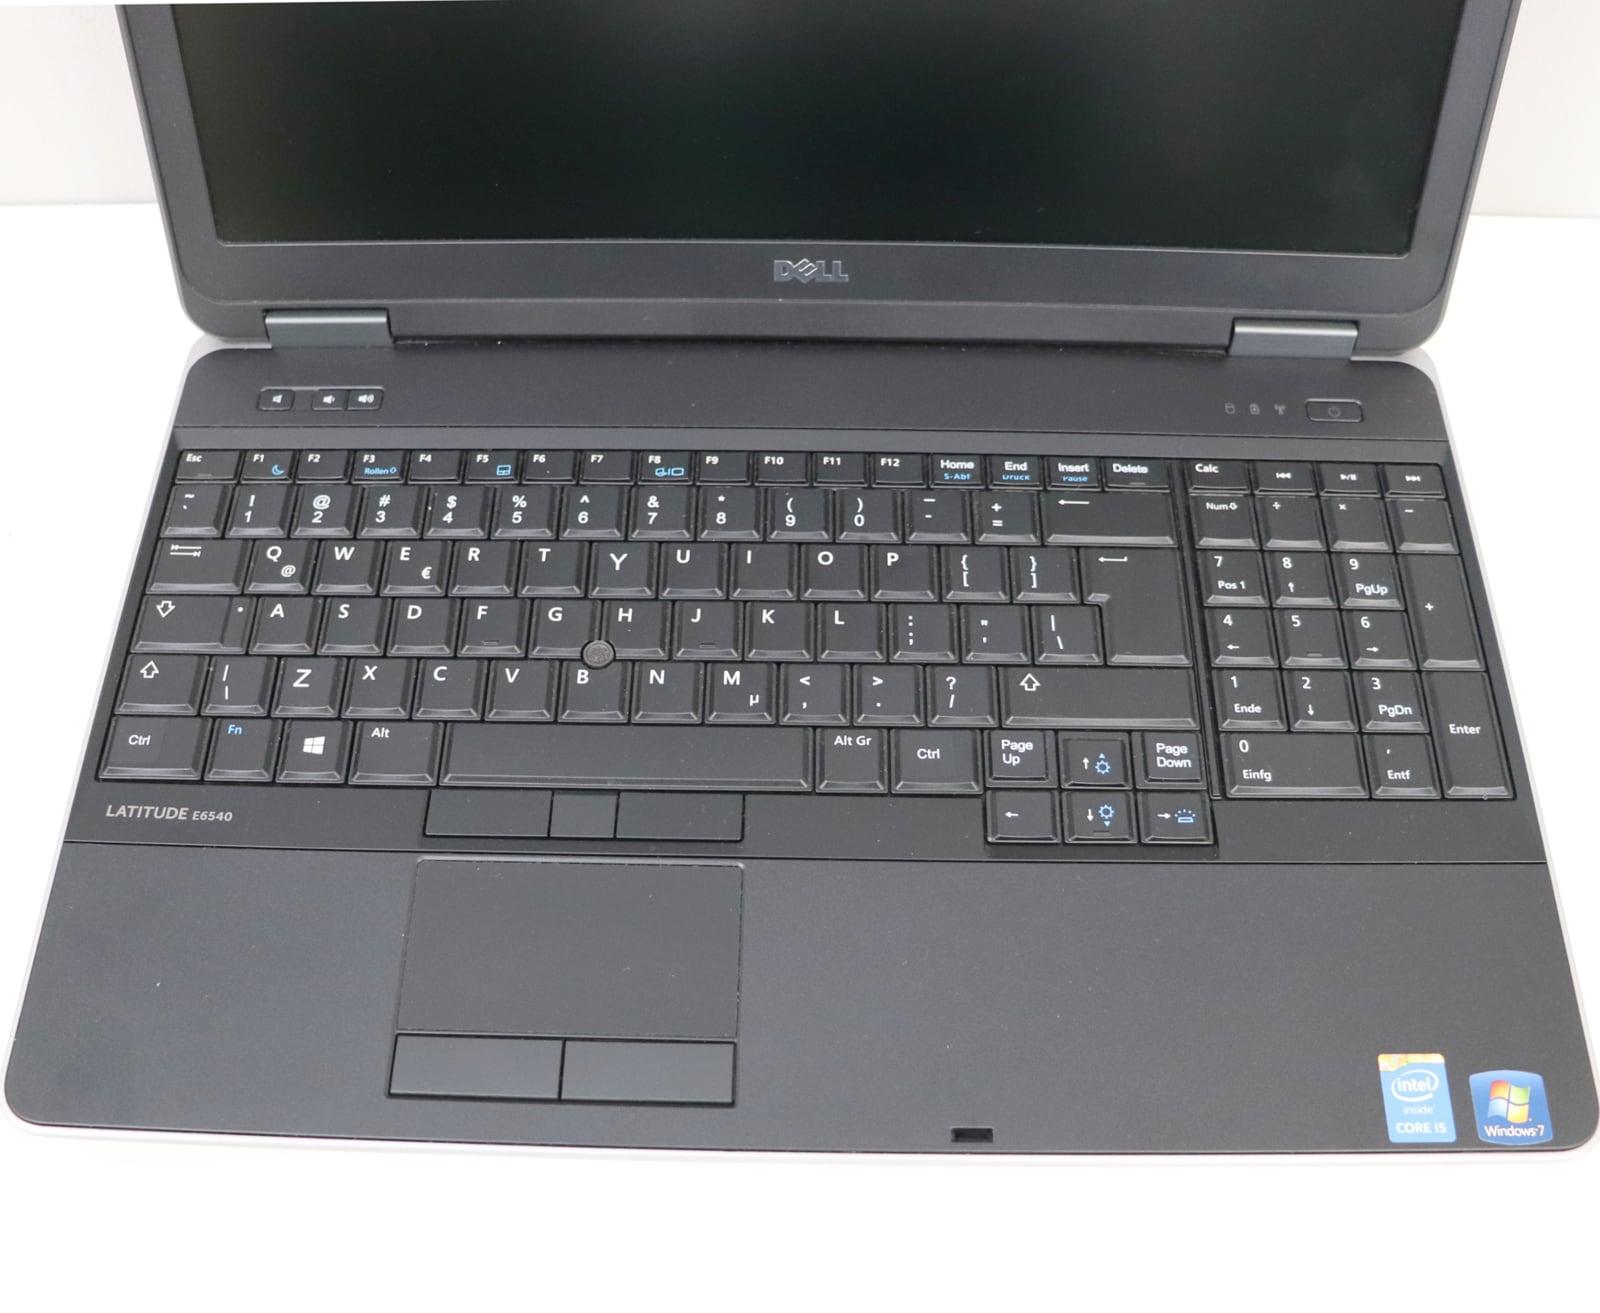 Laptop Dell Latitude E6540 i7 - 4 generacji / 16GB / 240 GB SSD / 15,6 HD / Klasa A- - 5